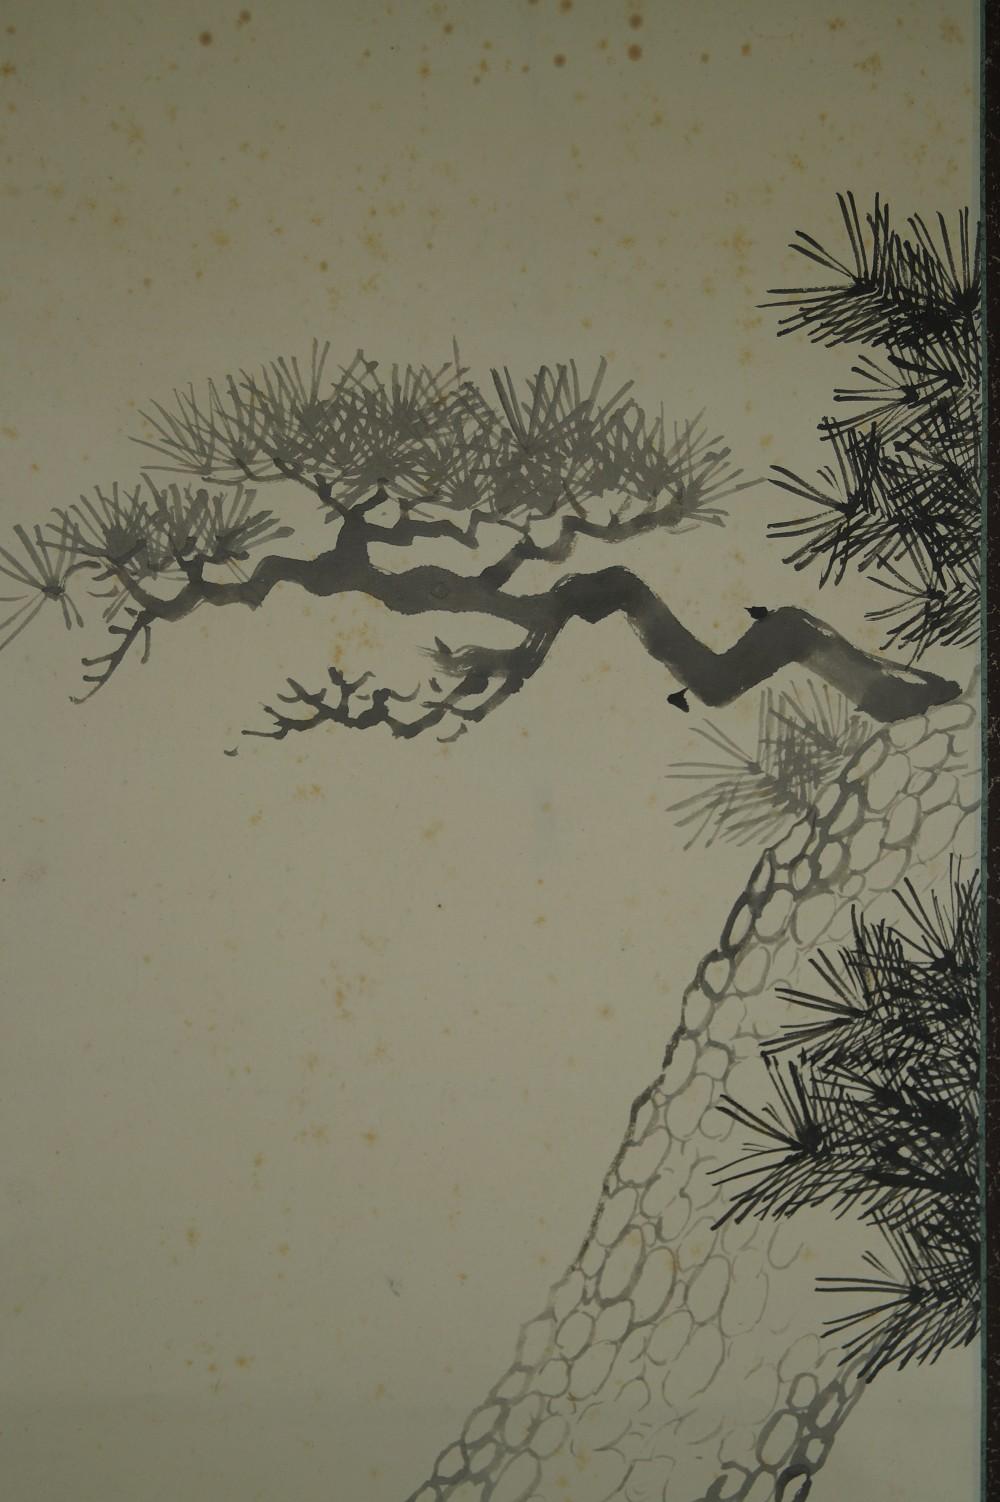 Alte Kiefer - Japanisches Rollbild (Kakejiku, Kakemono)